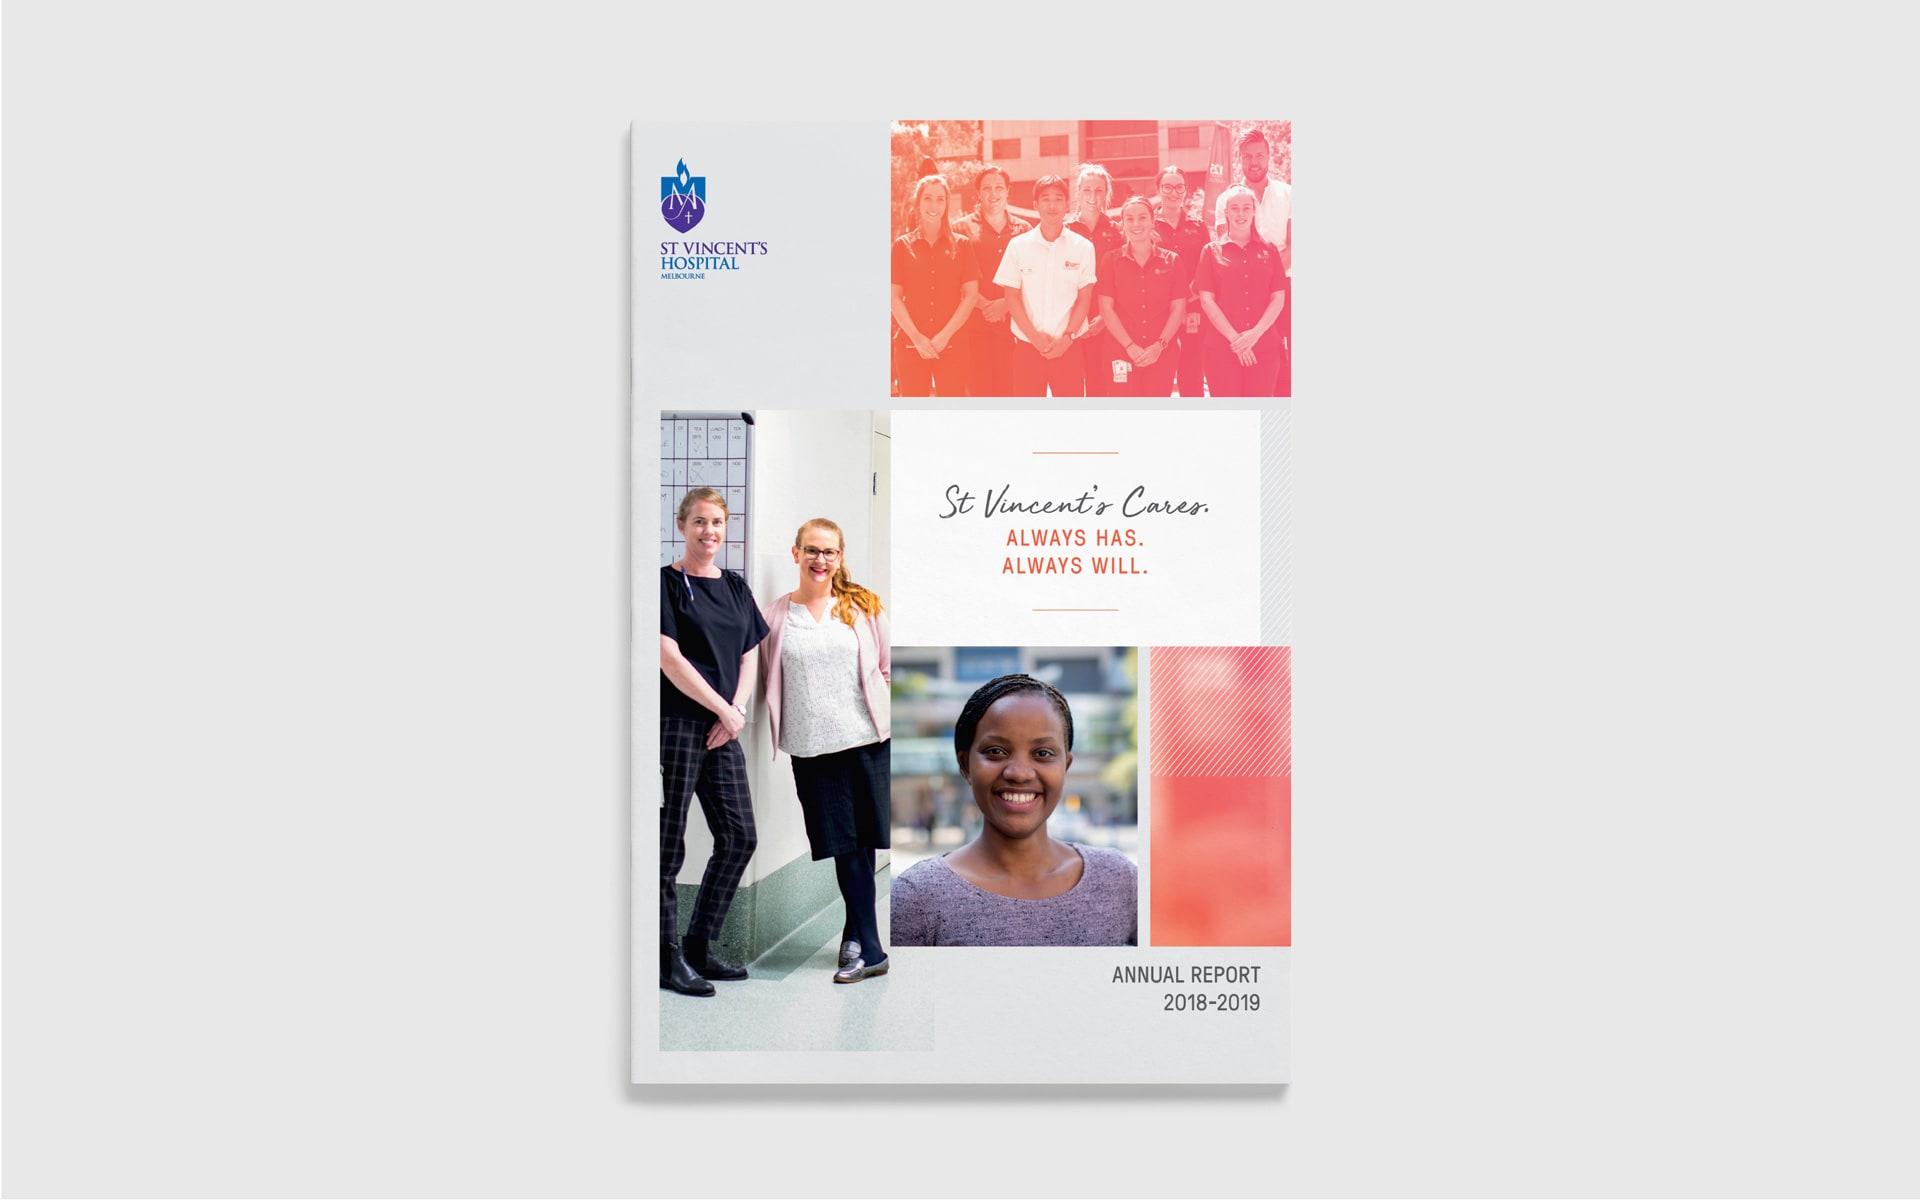 St-Vincents-Hospital-Melbourne-Annual-Report-Design